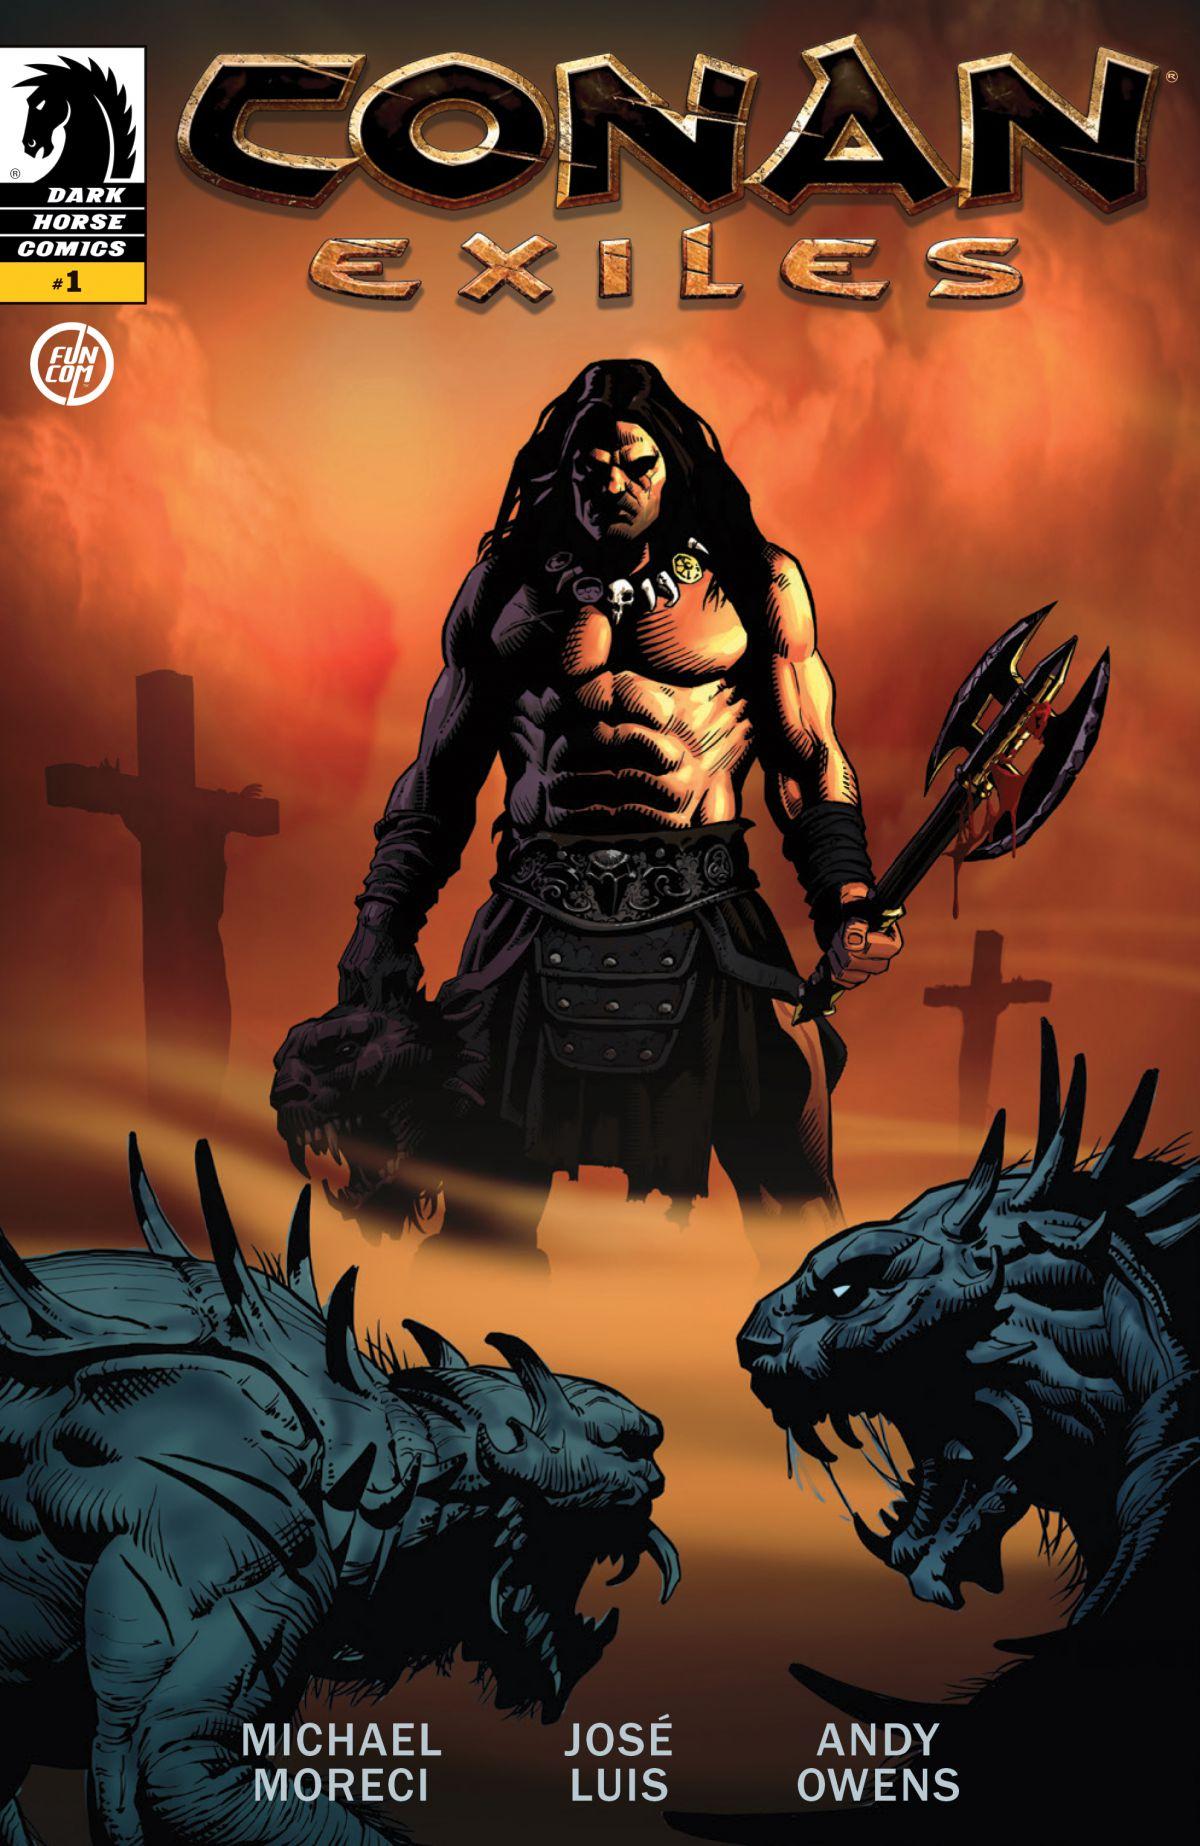 Комикс по Conan Exiles и система рабства на стриме 17114